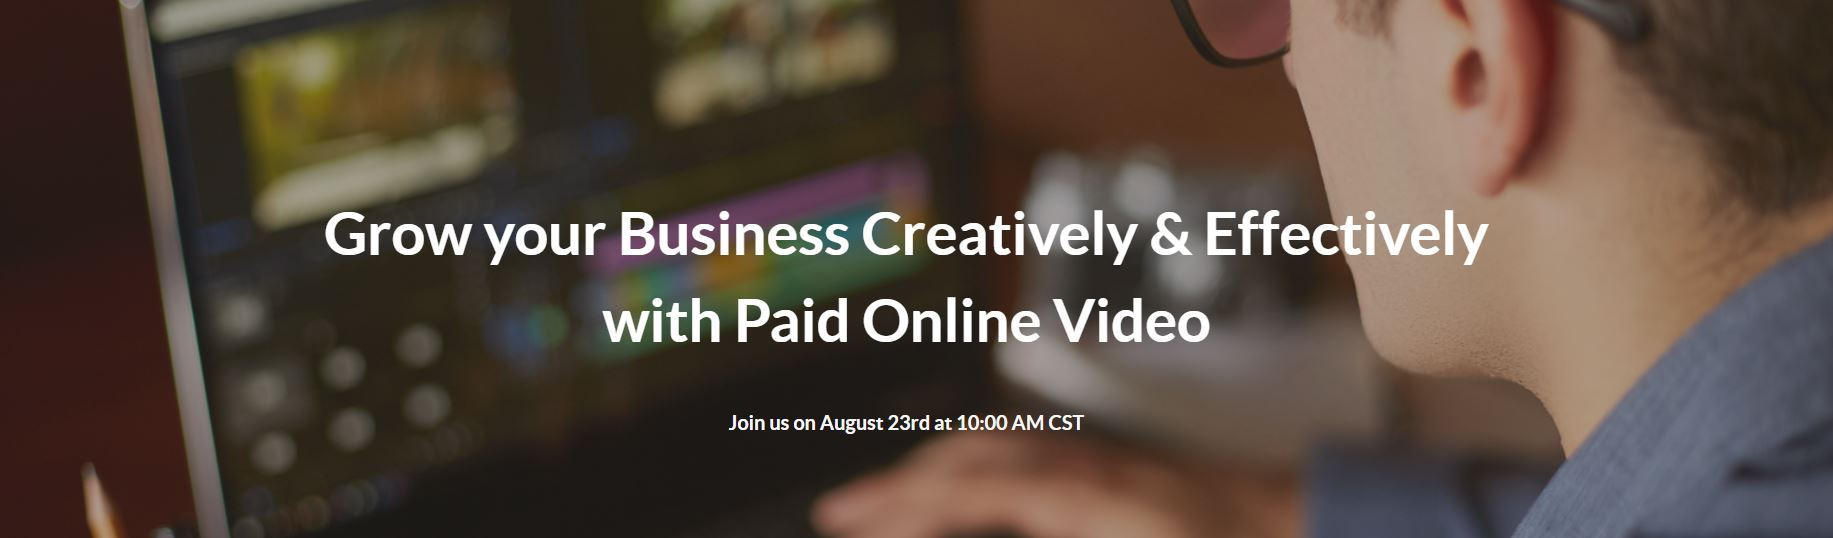 Online Video Webinar